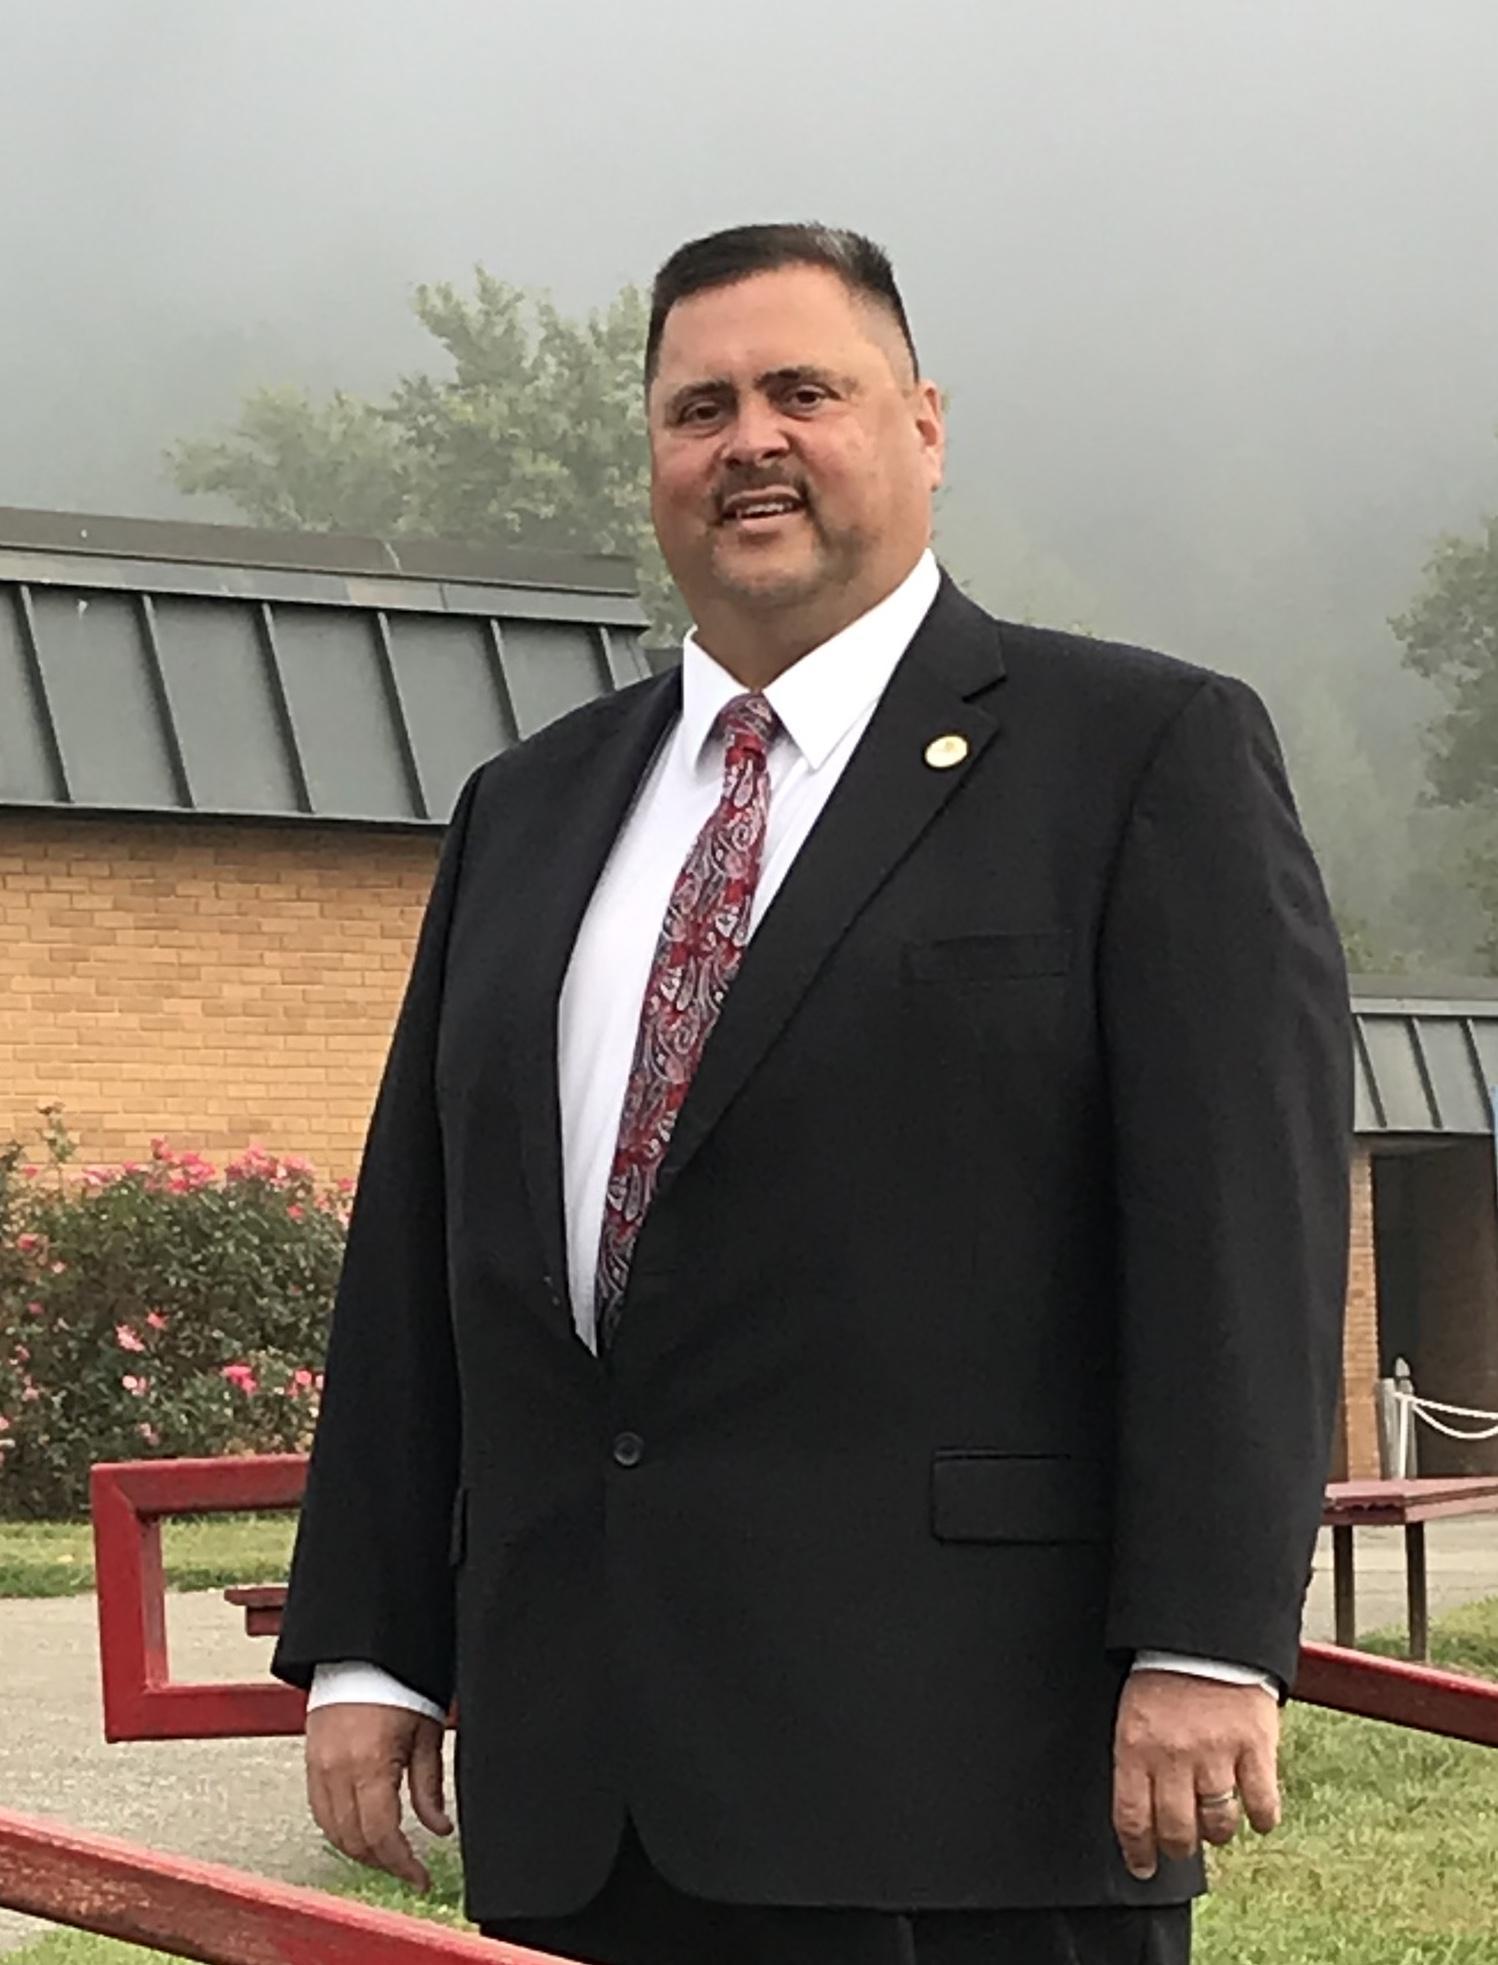 Superintendent Danny Adkins photo